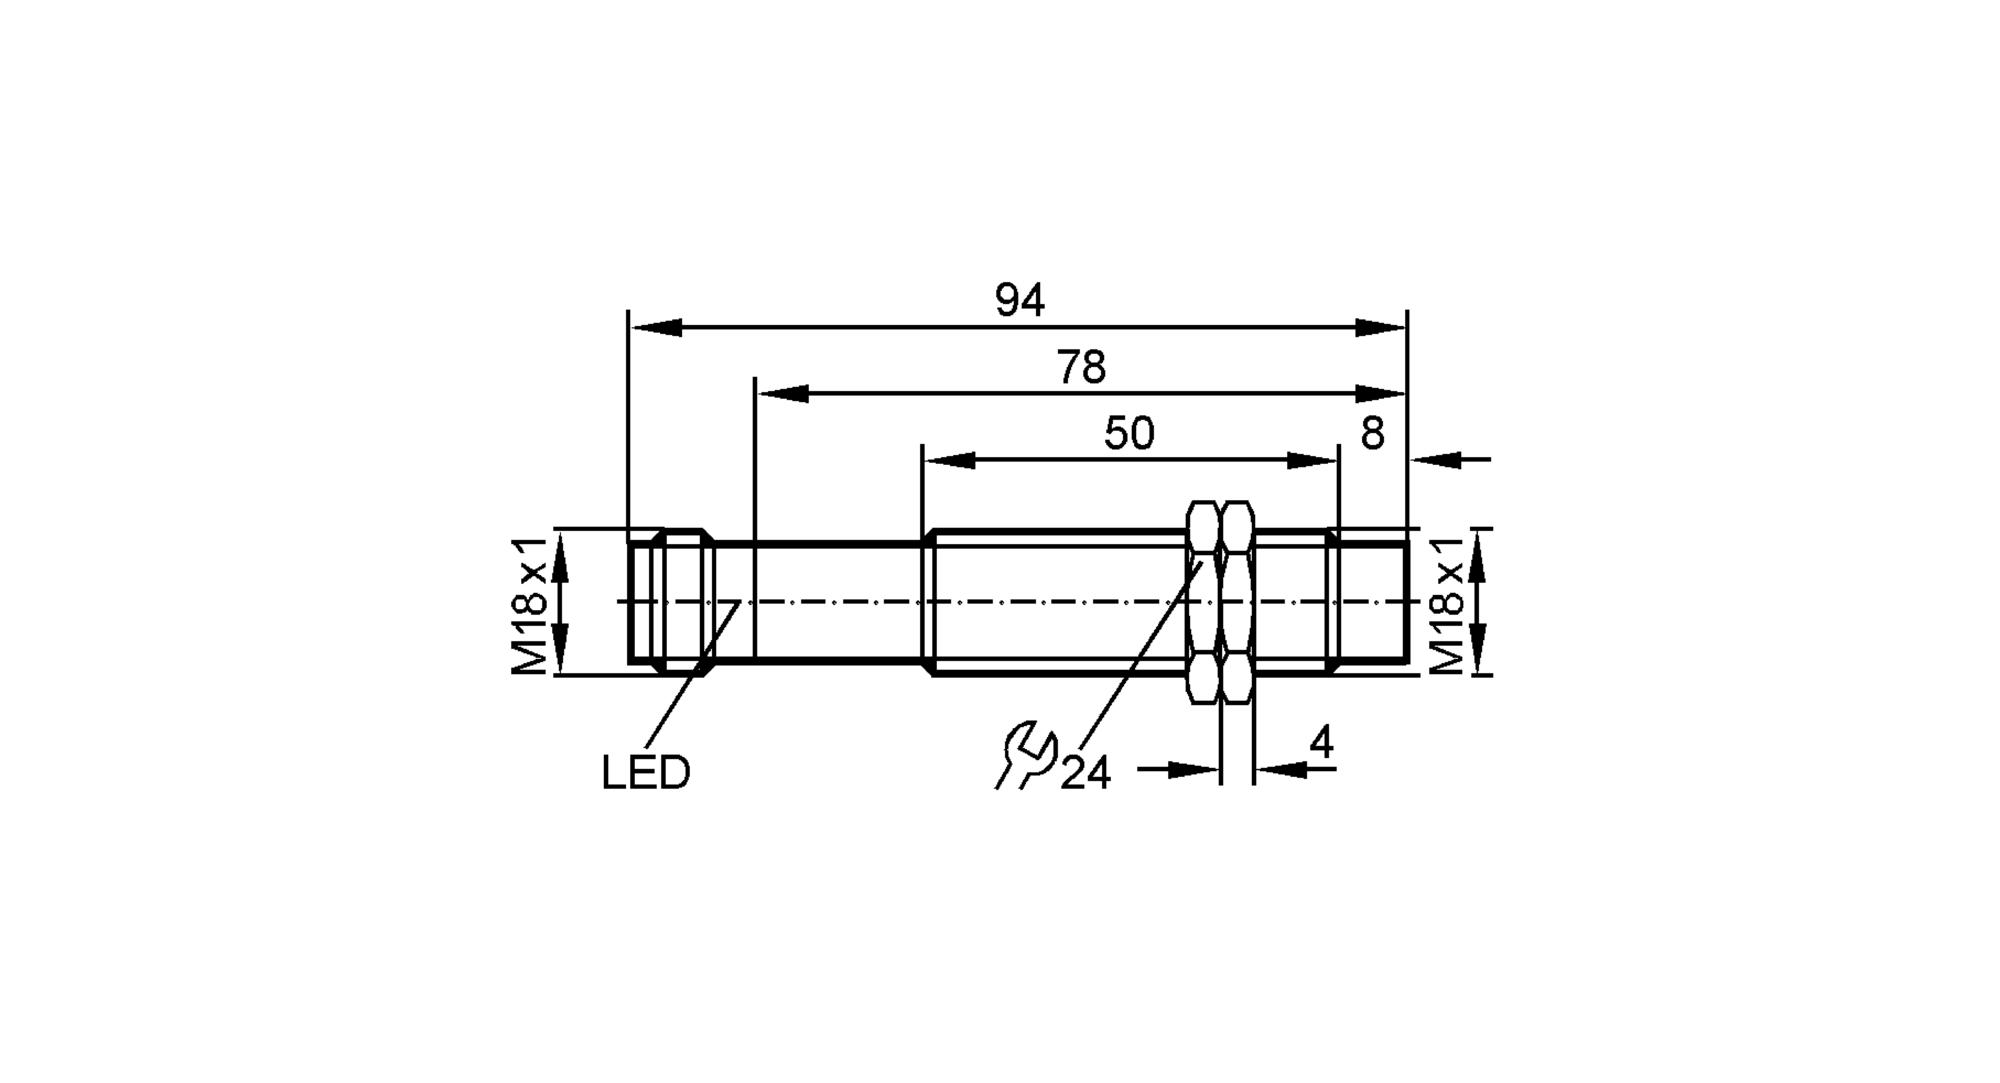 ig5893 - inductive sensor